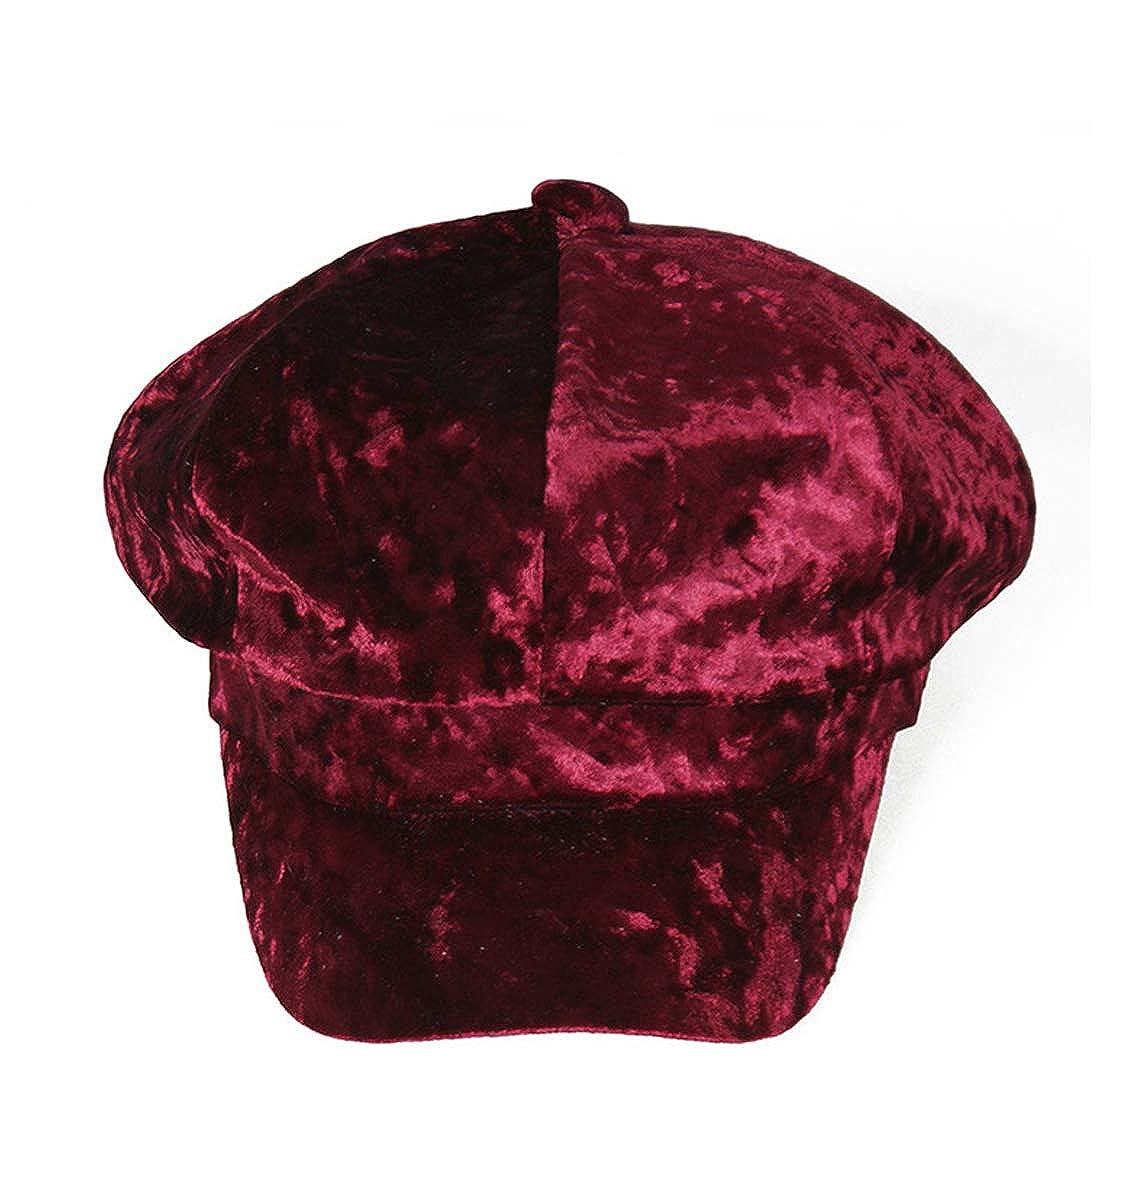 Clecibor Velvet Newsboy Cap Autumn Winter Warm Thick Octagonal Cap Women Beret